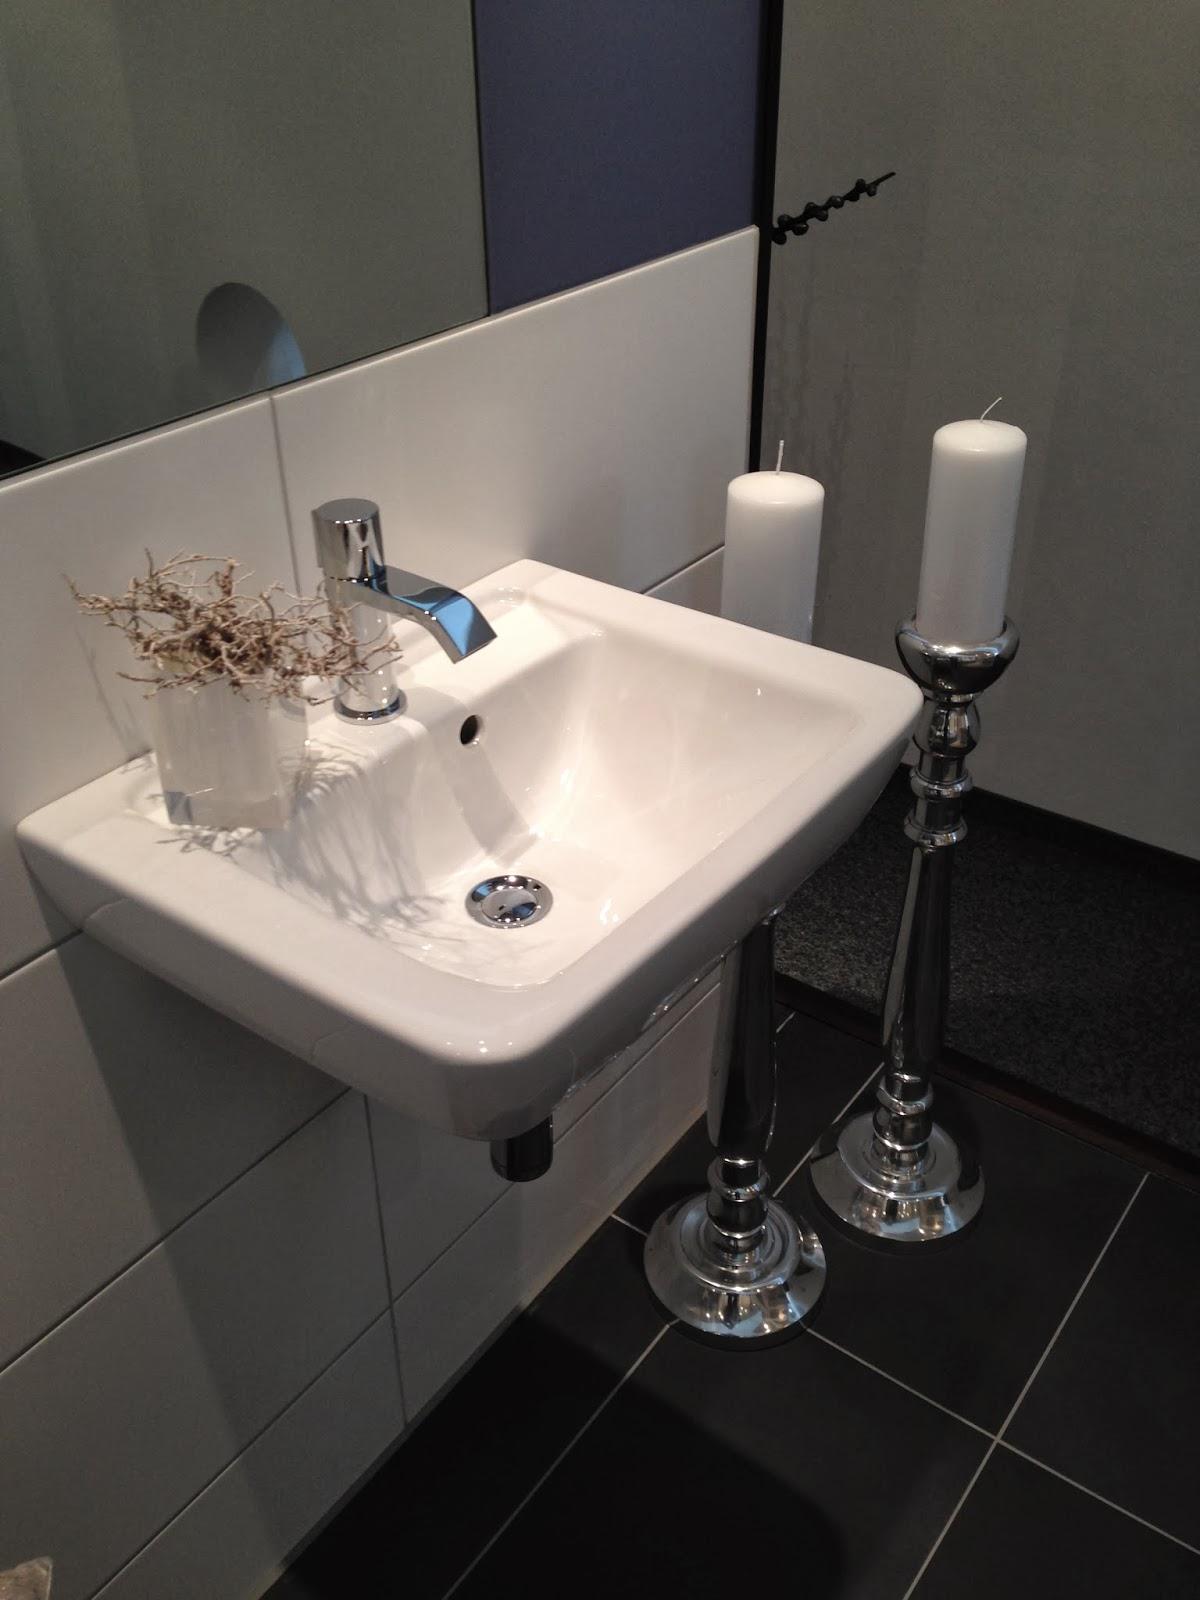 bautagebuch das schlo projekt 2014 bemusterung in bad. Black Bedroom Furniture Sets. Home Design Ideas